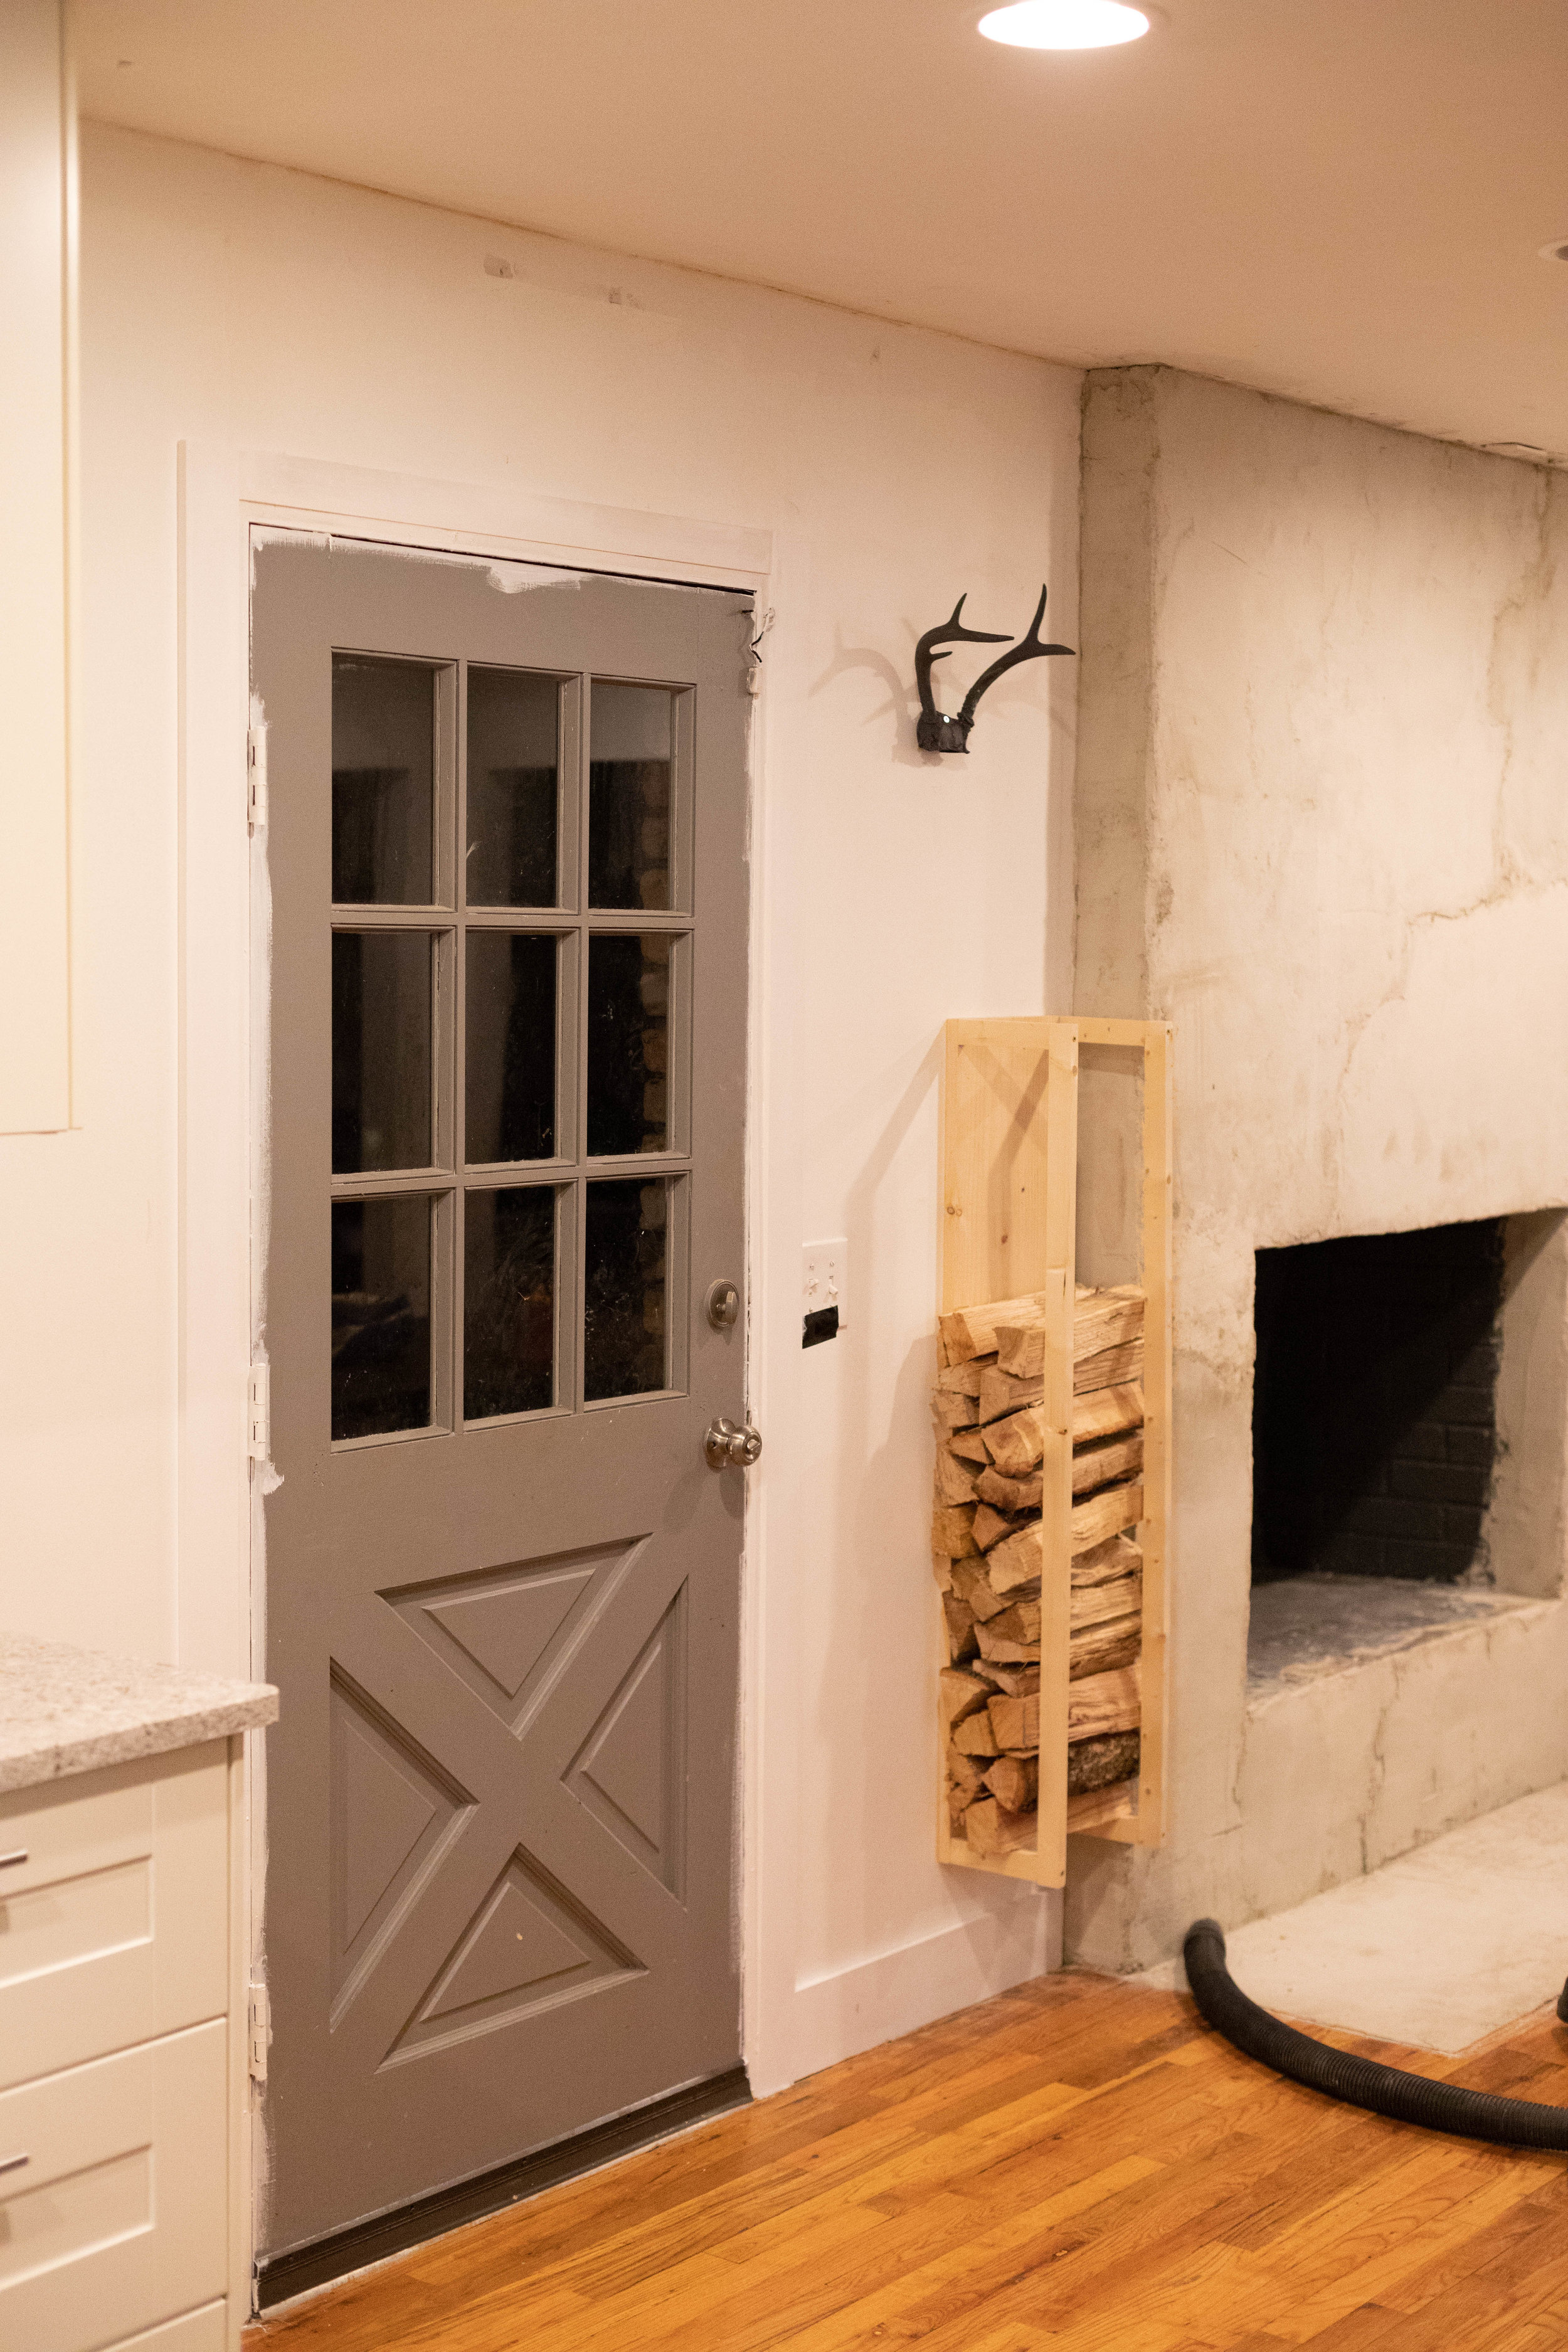 FARMHOUSE 'X' DOOR